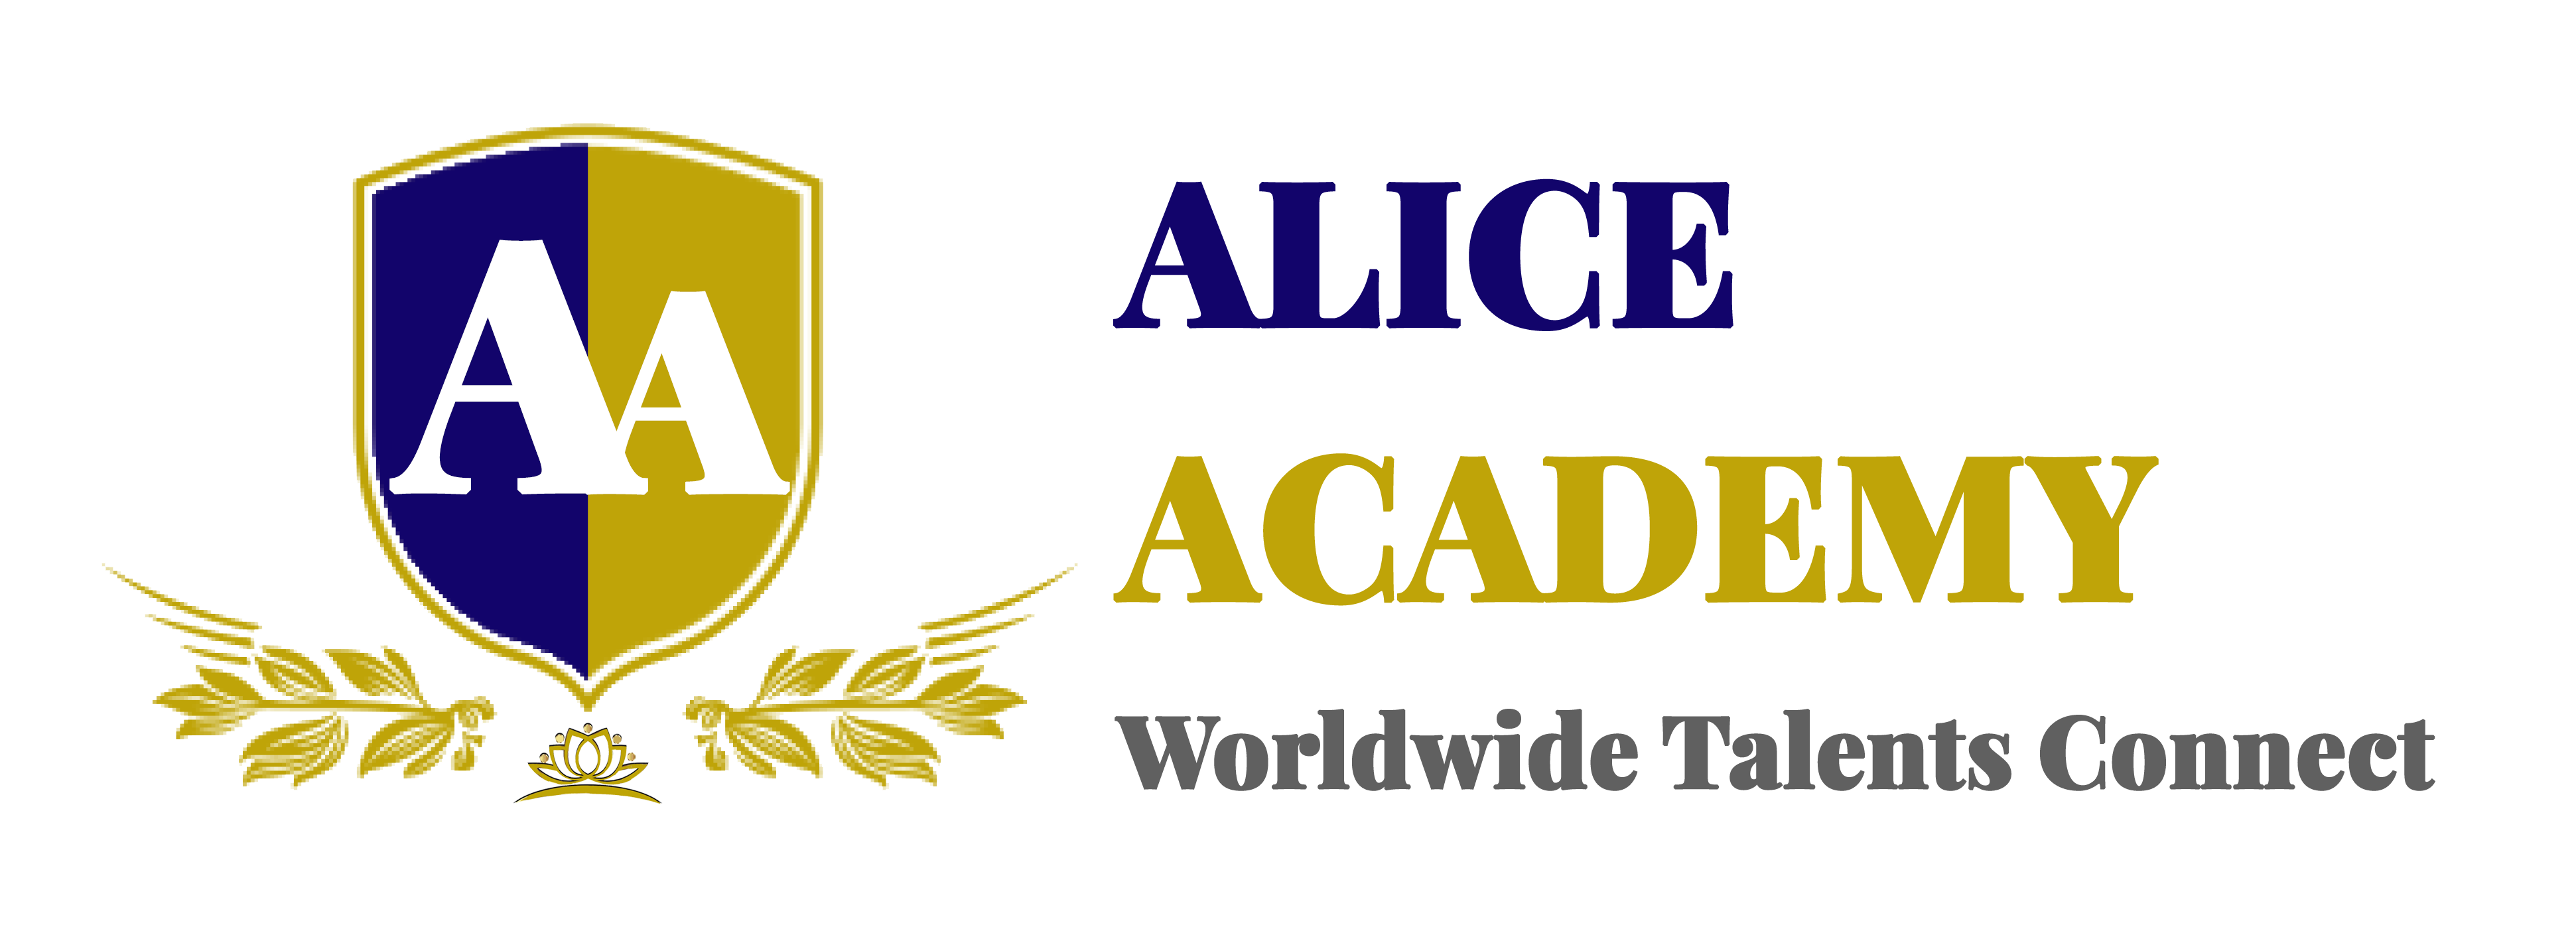 Tư Vấn Du Học Alice Academy